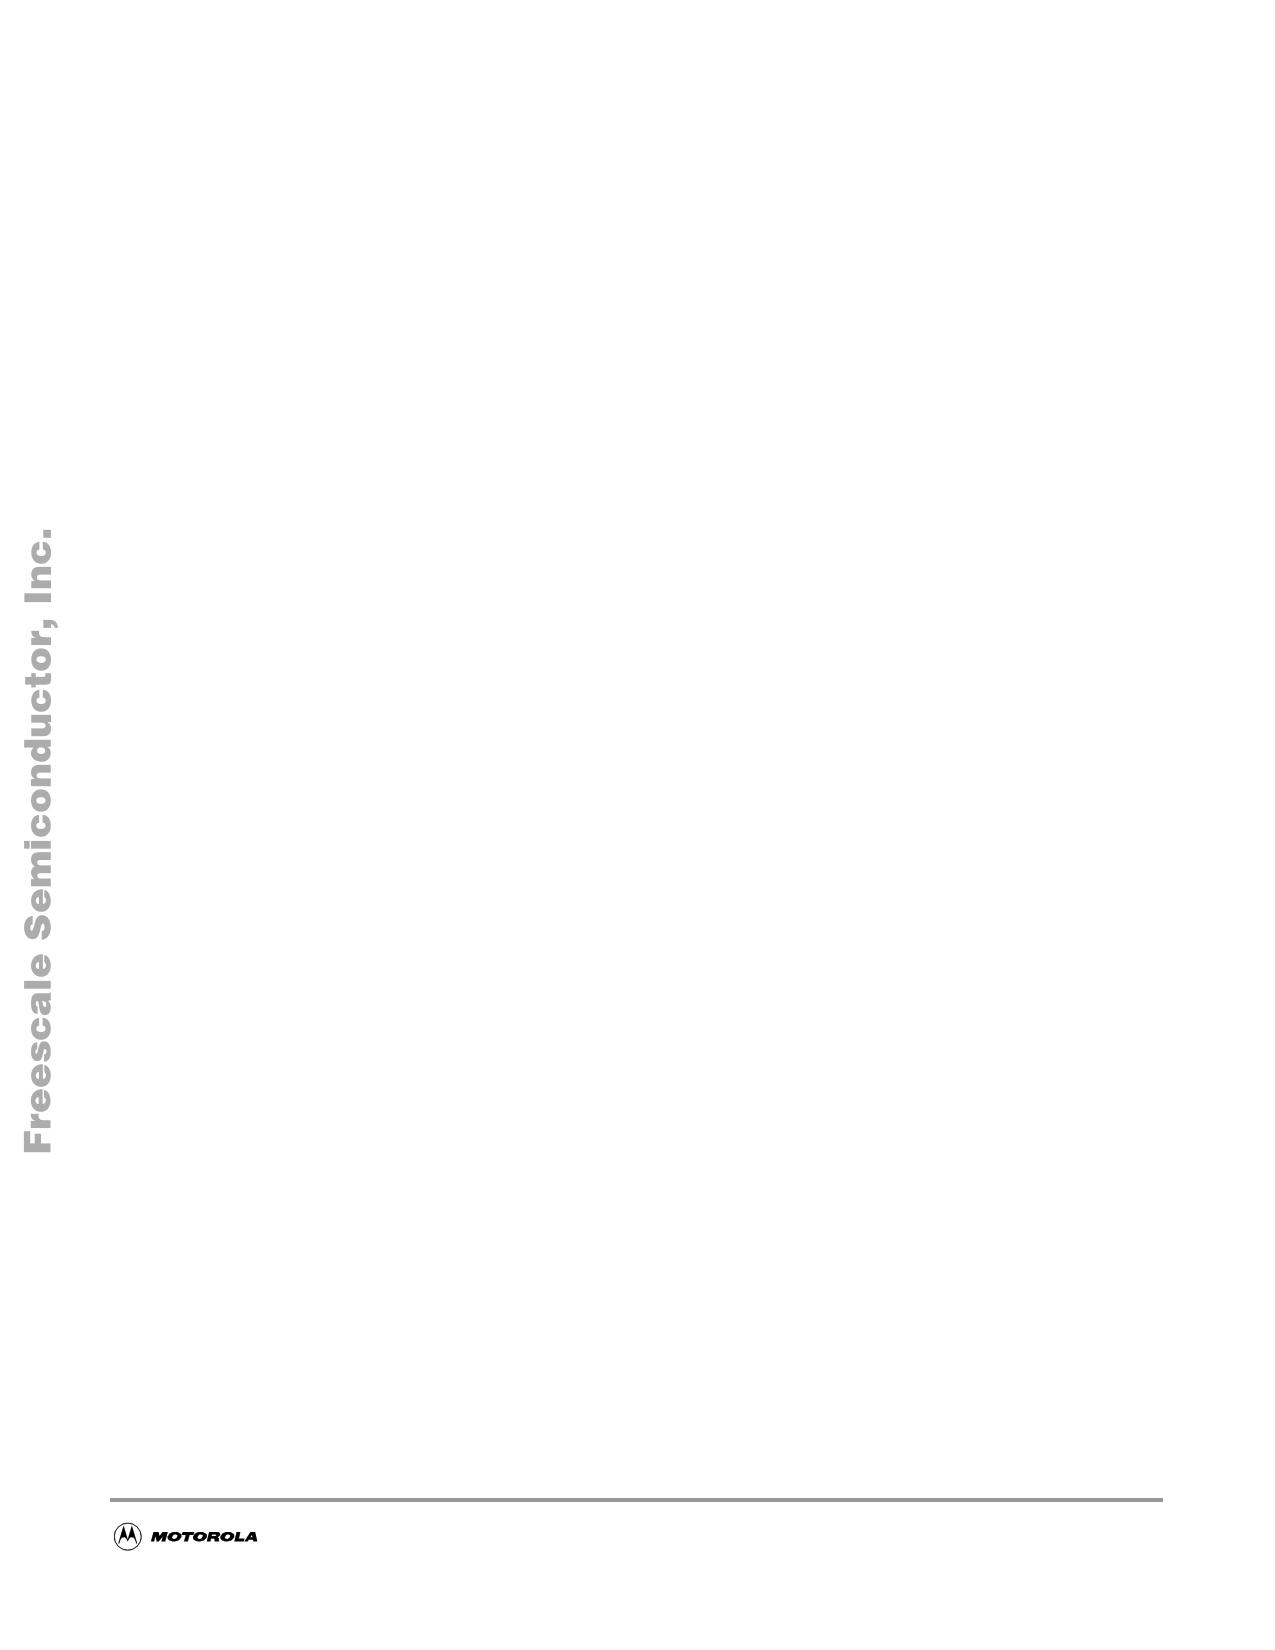 MC9S12DJ256B 데이터시트 및 MC9S12DJ256B PDF